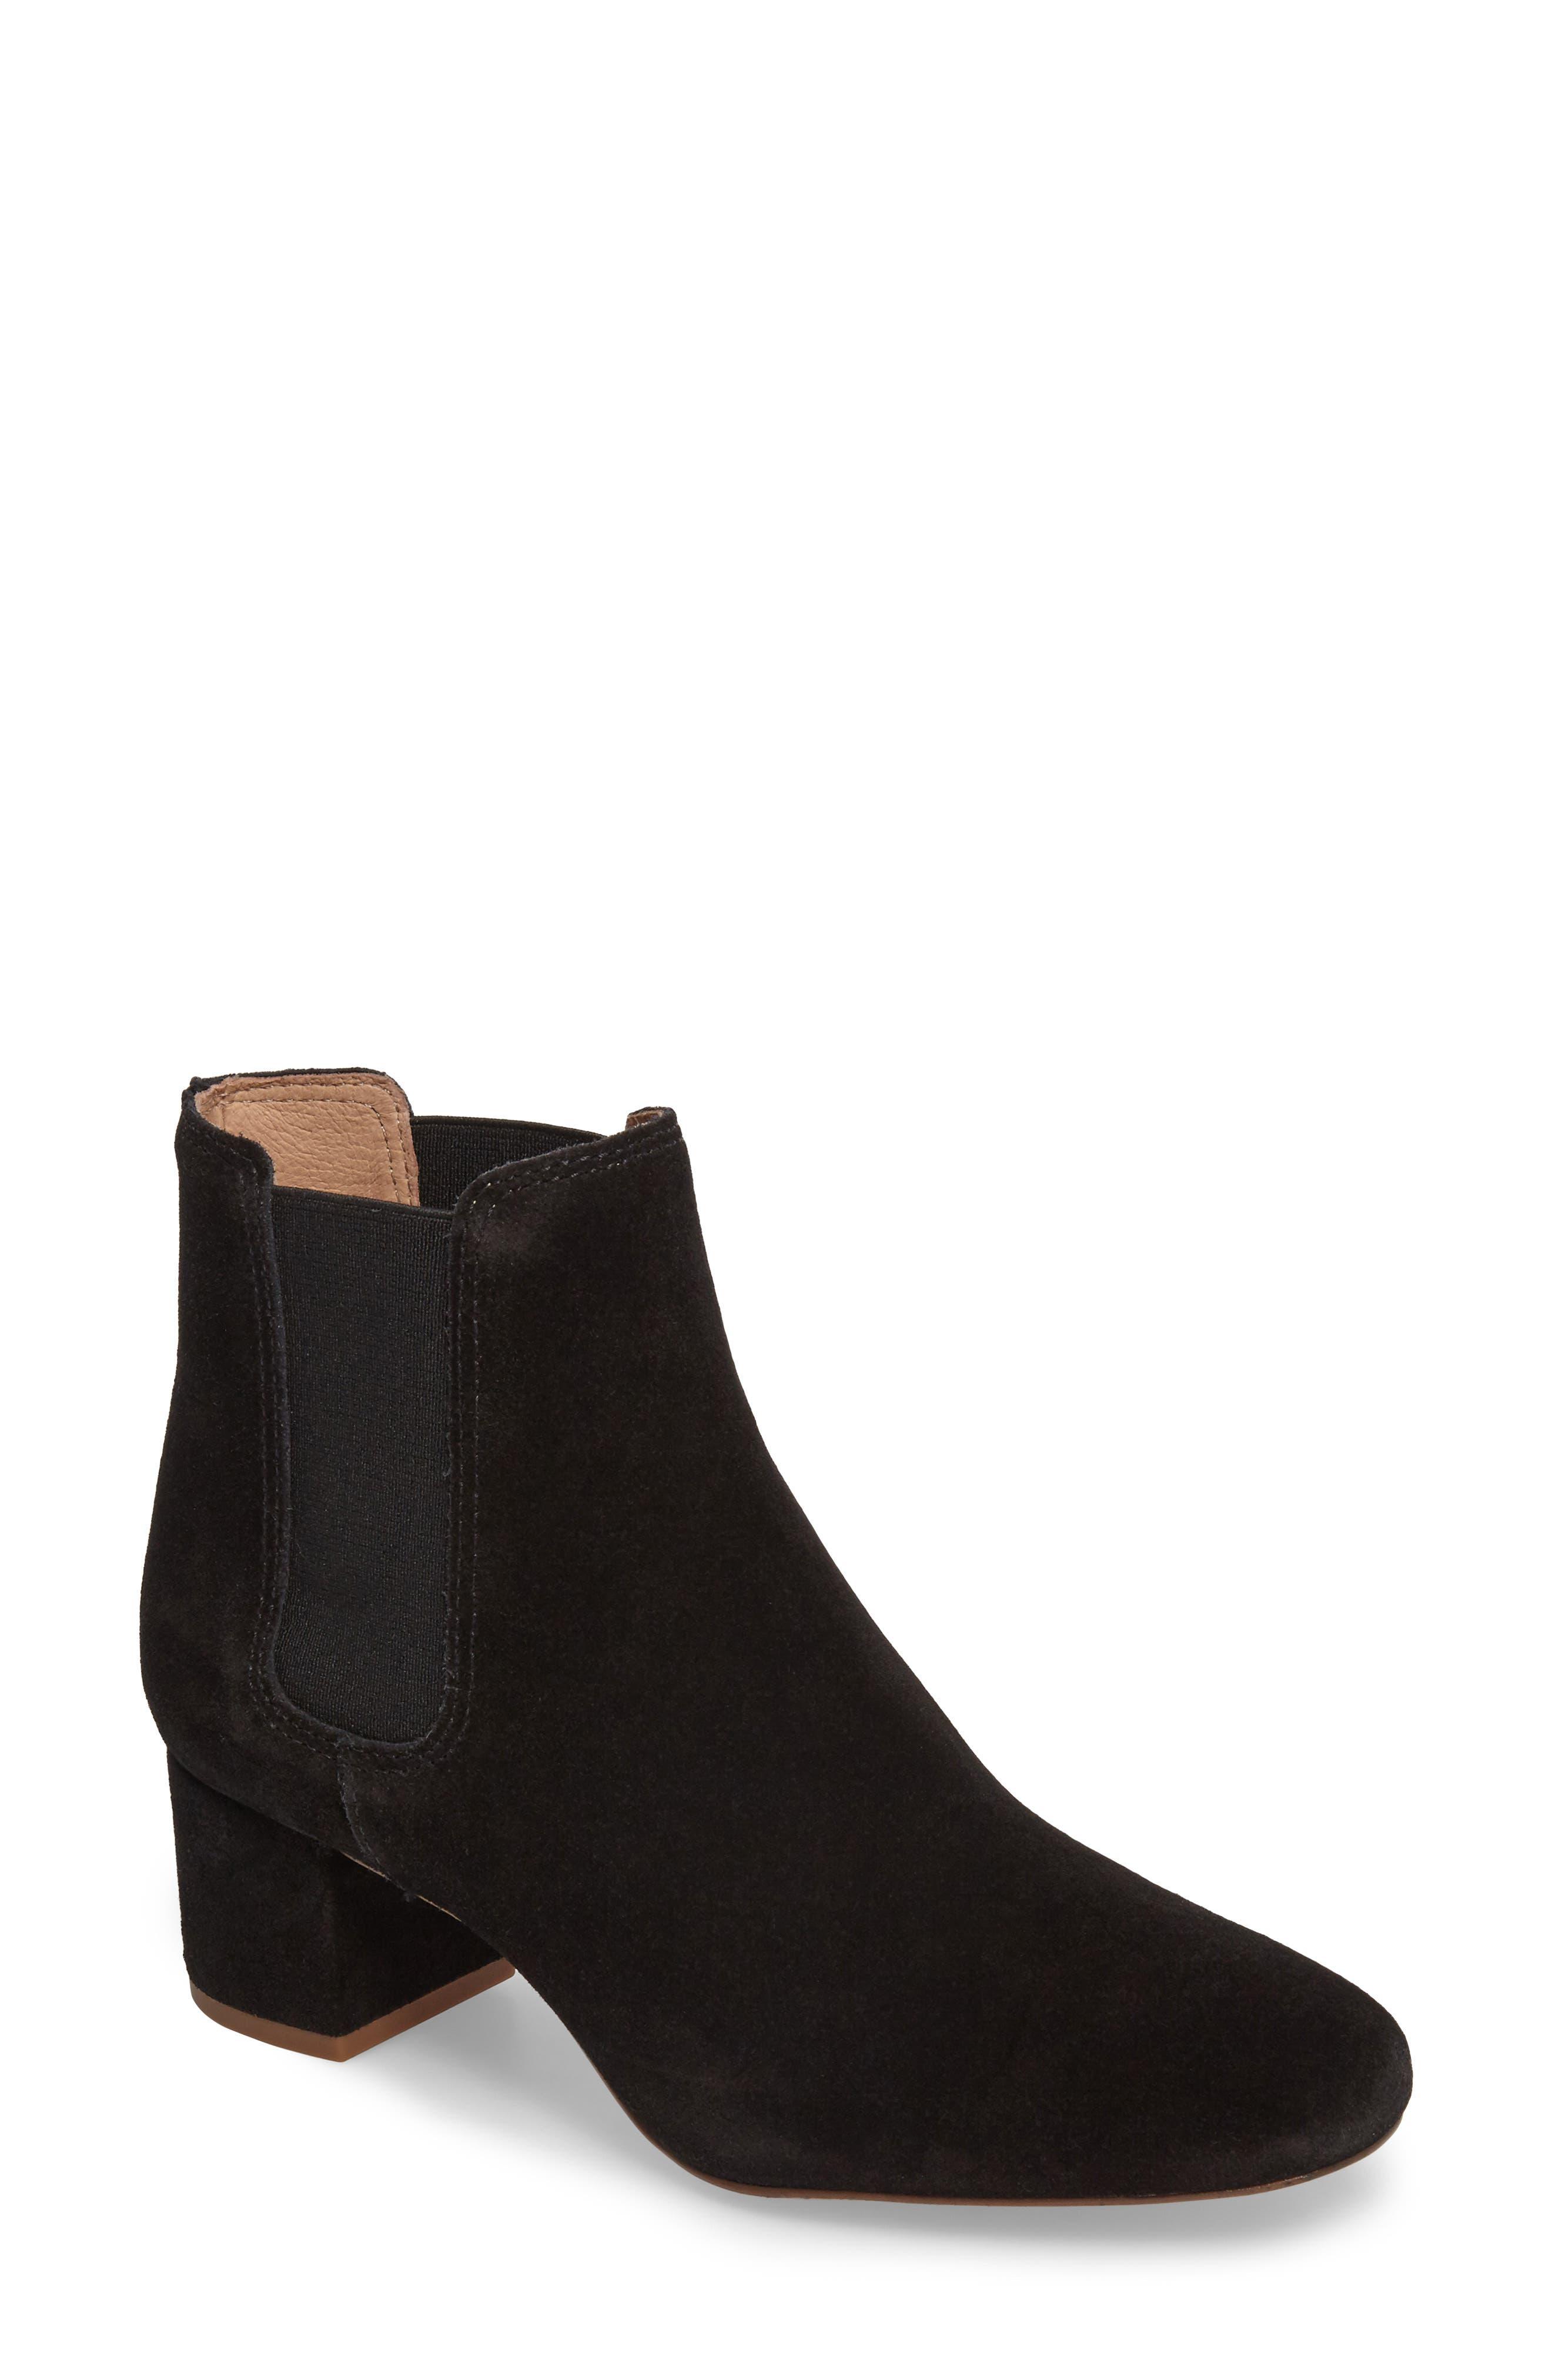 Alternate Image 1 Selected - Madewell Walker Chelsea Boot (Women)